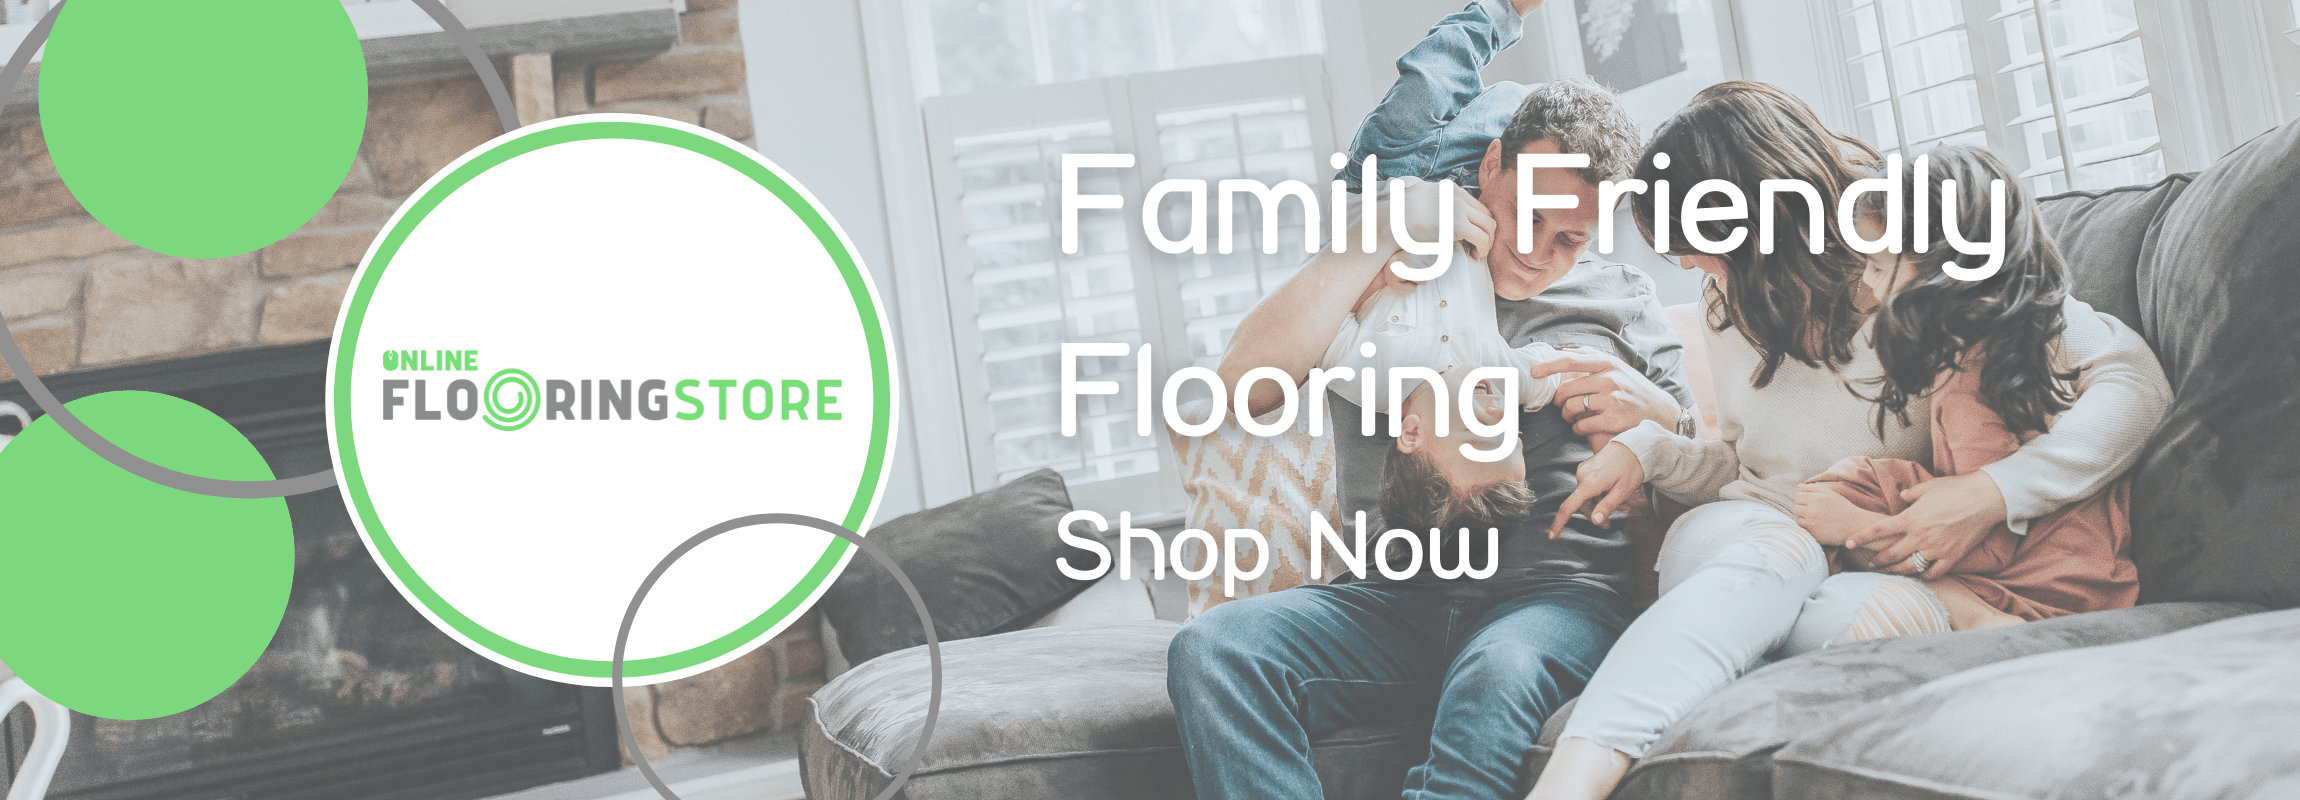 Family Friendly Home Flooring